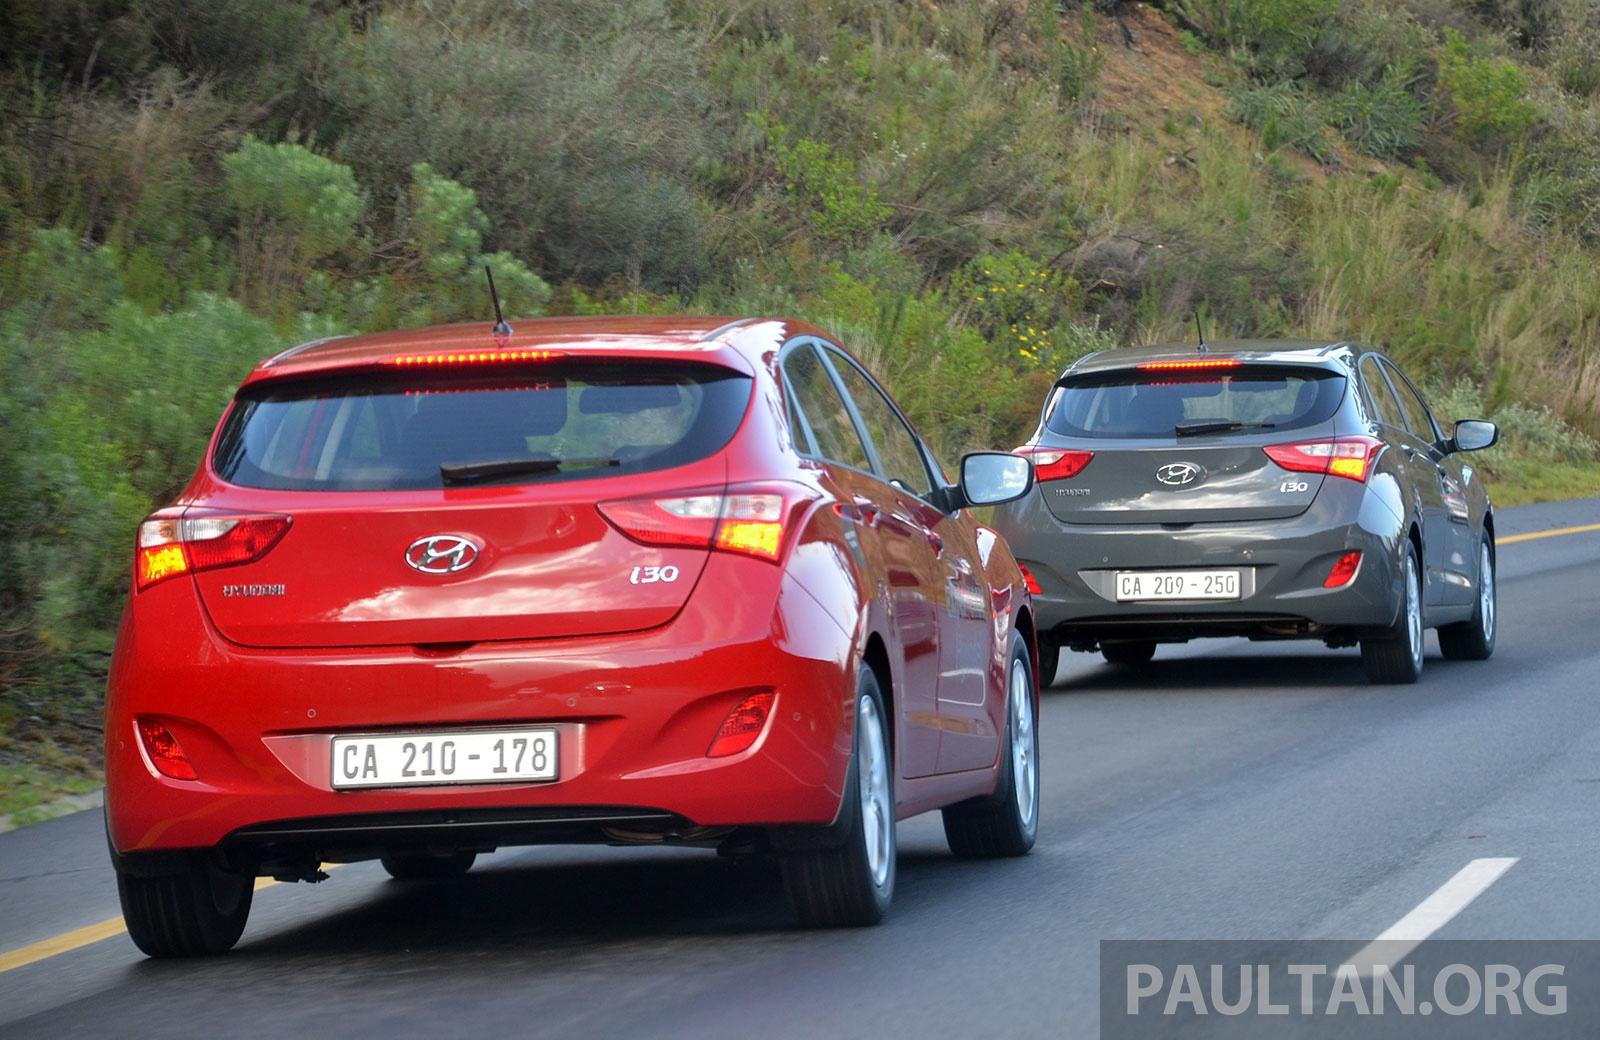 DRIVEN: New Hyundai i30 plays a good round of Golf Paul ...